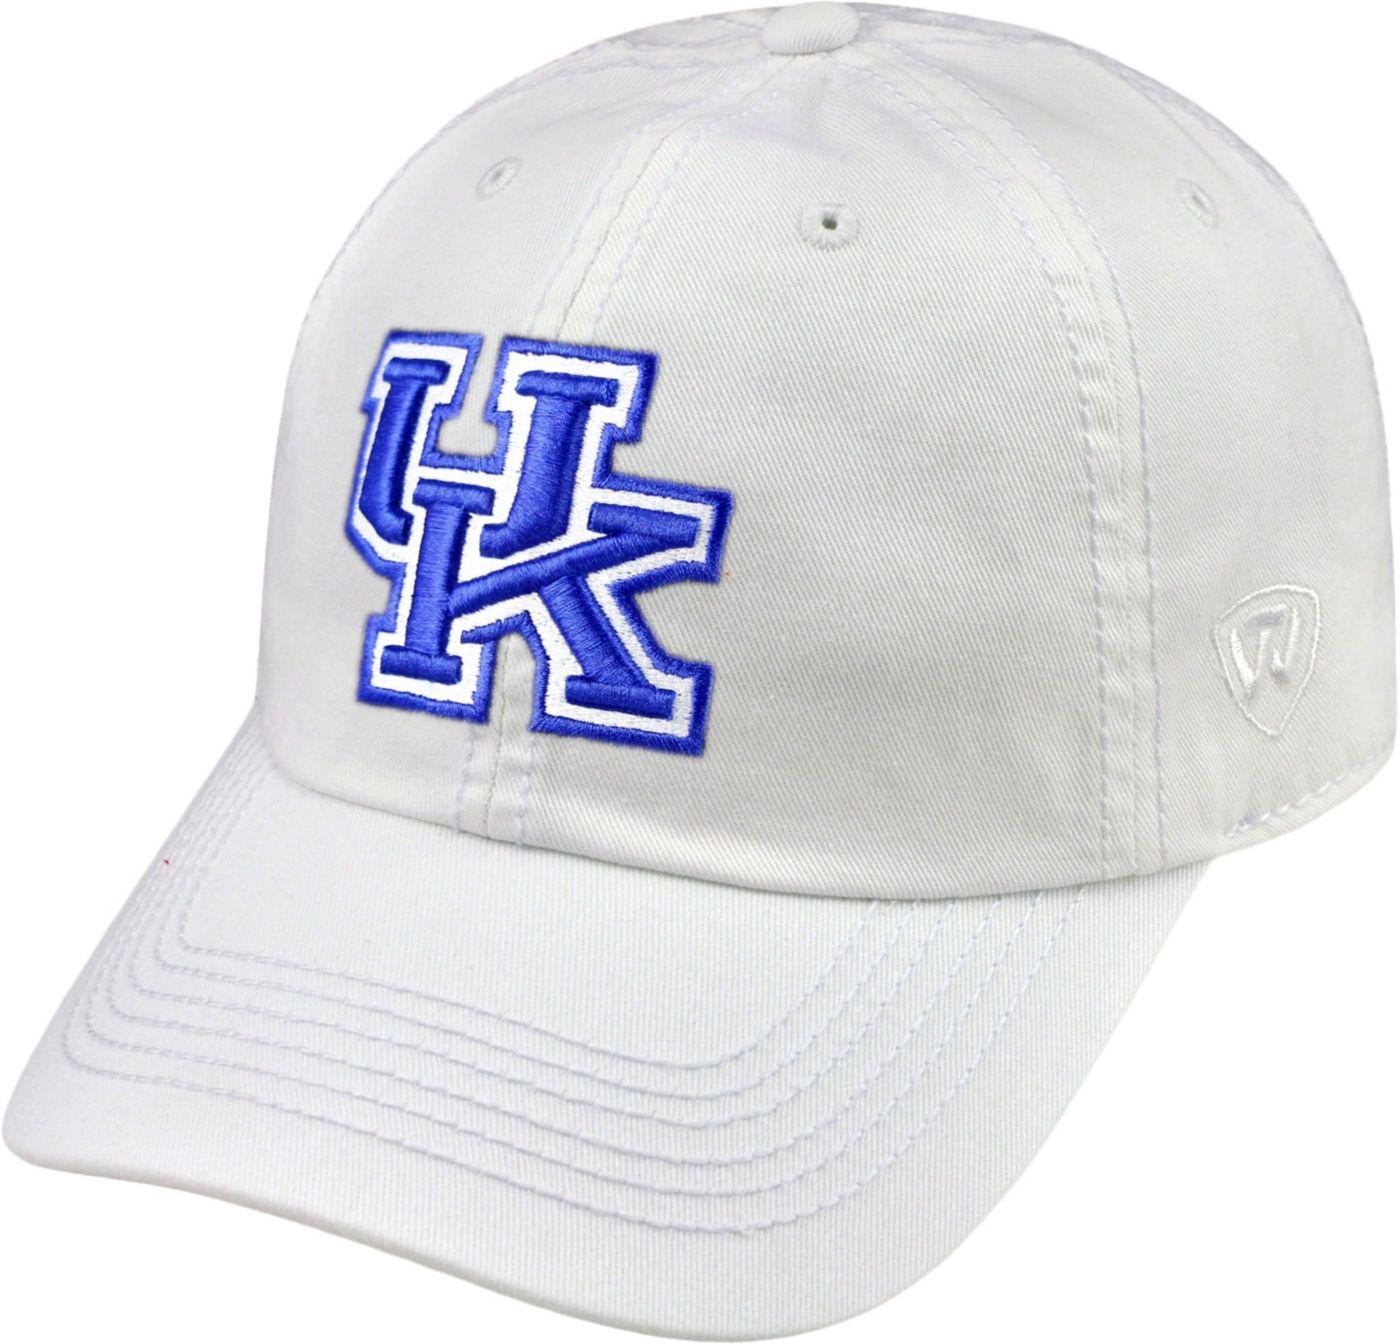 Top of the World Men's Kentucky Wildcats White Crew Hat